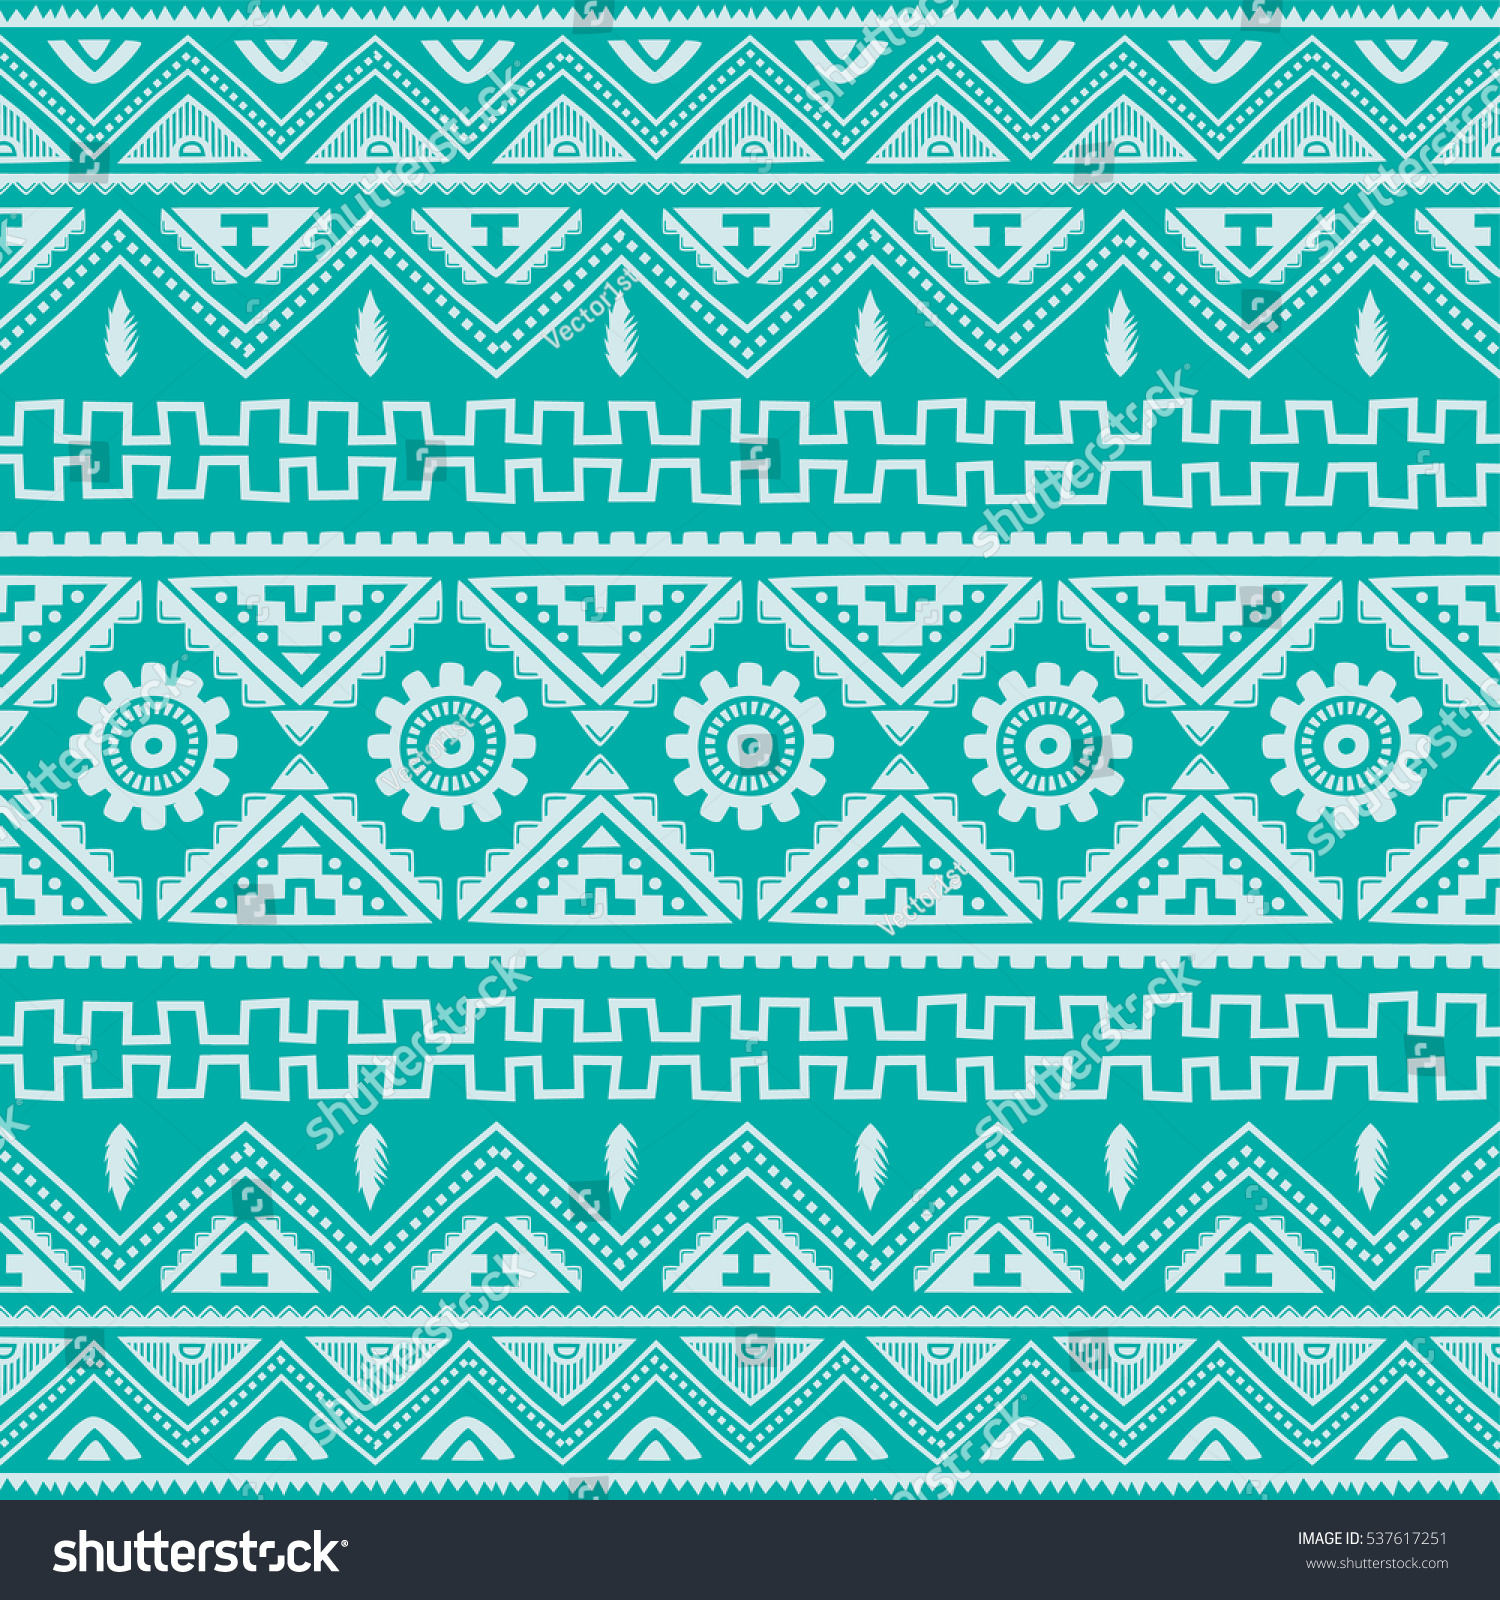 color native american ethnic pattern stock illustration 537617251